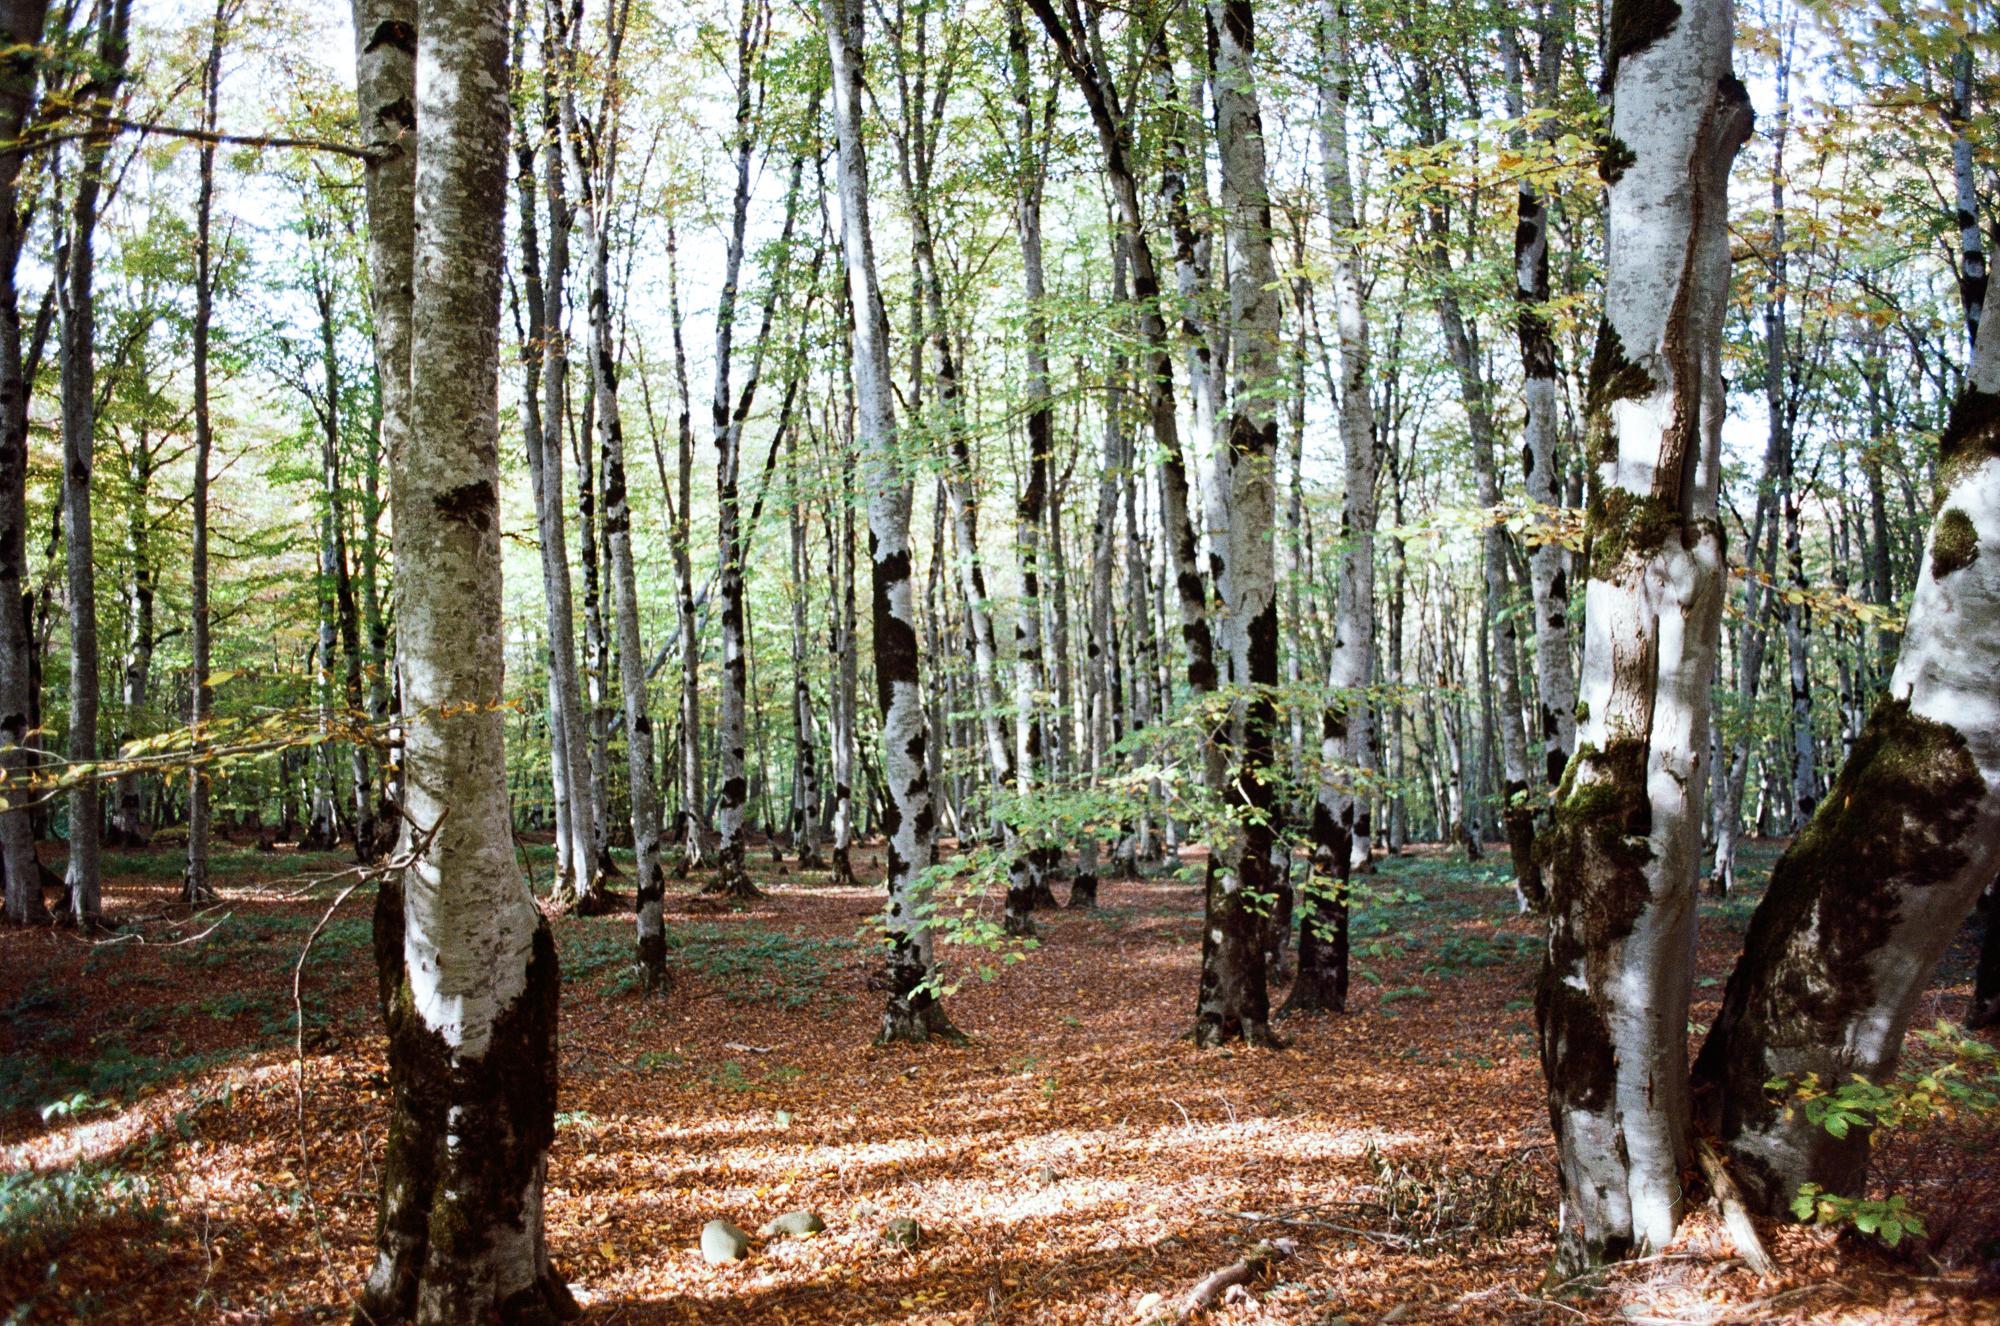 Sabaduri Forest, Tbilisi National Park, Georgia: Nikon F3, Zeiss Planar 50mm 1.7, Kodak Ektar 100